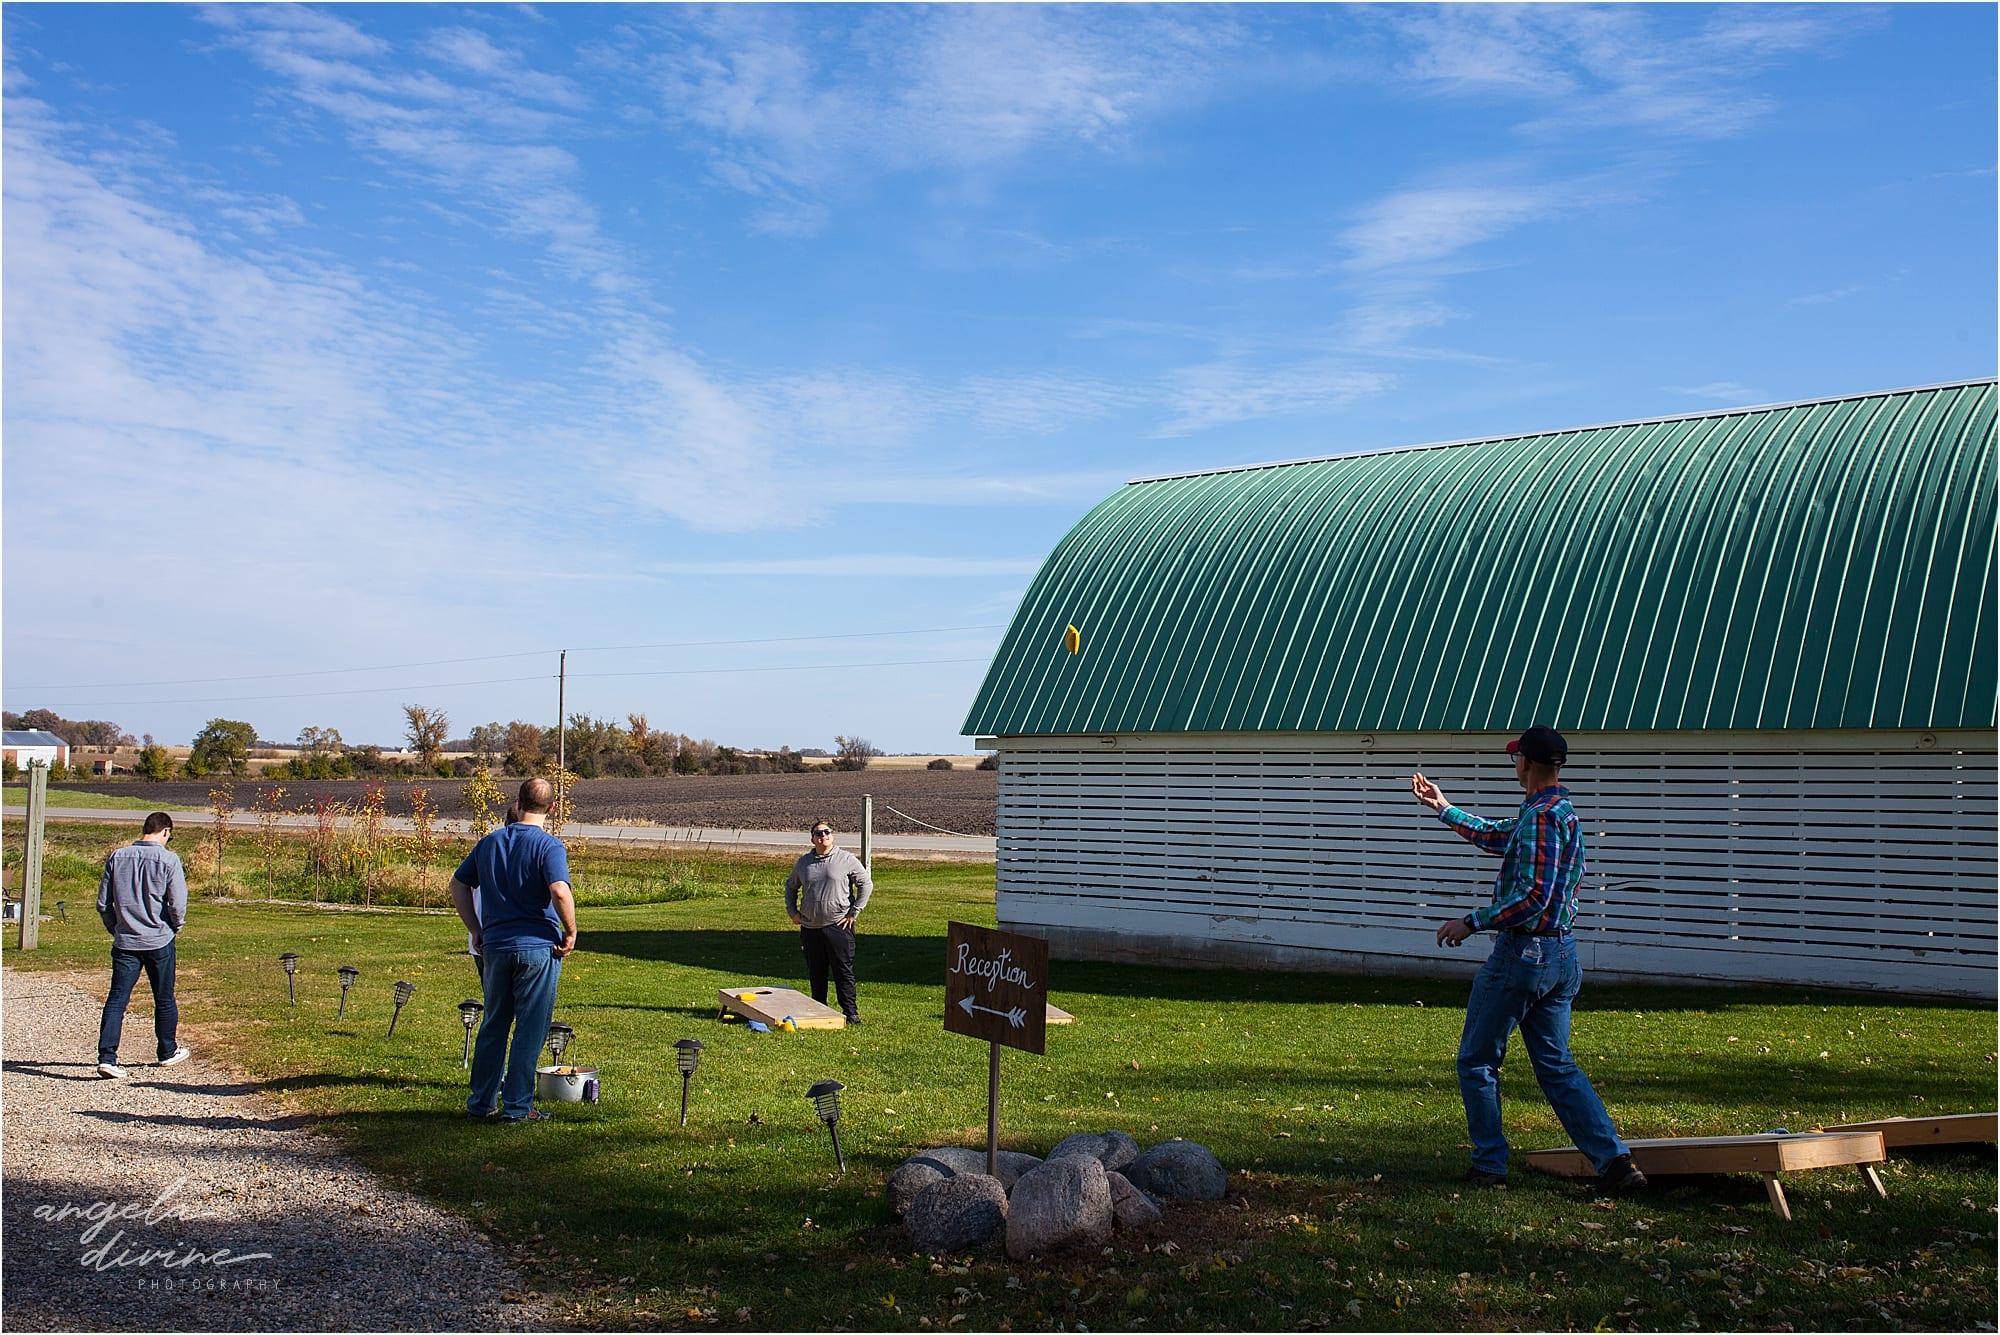 The Cottage Farmhouse Wedding lawn games